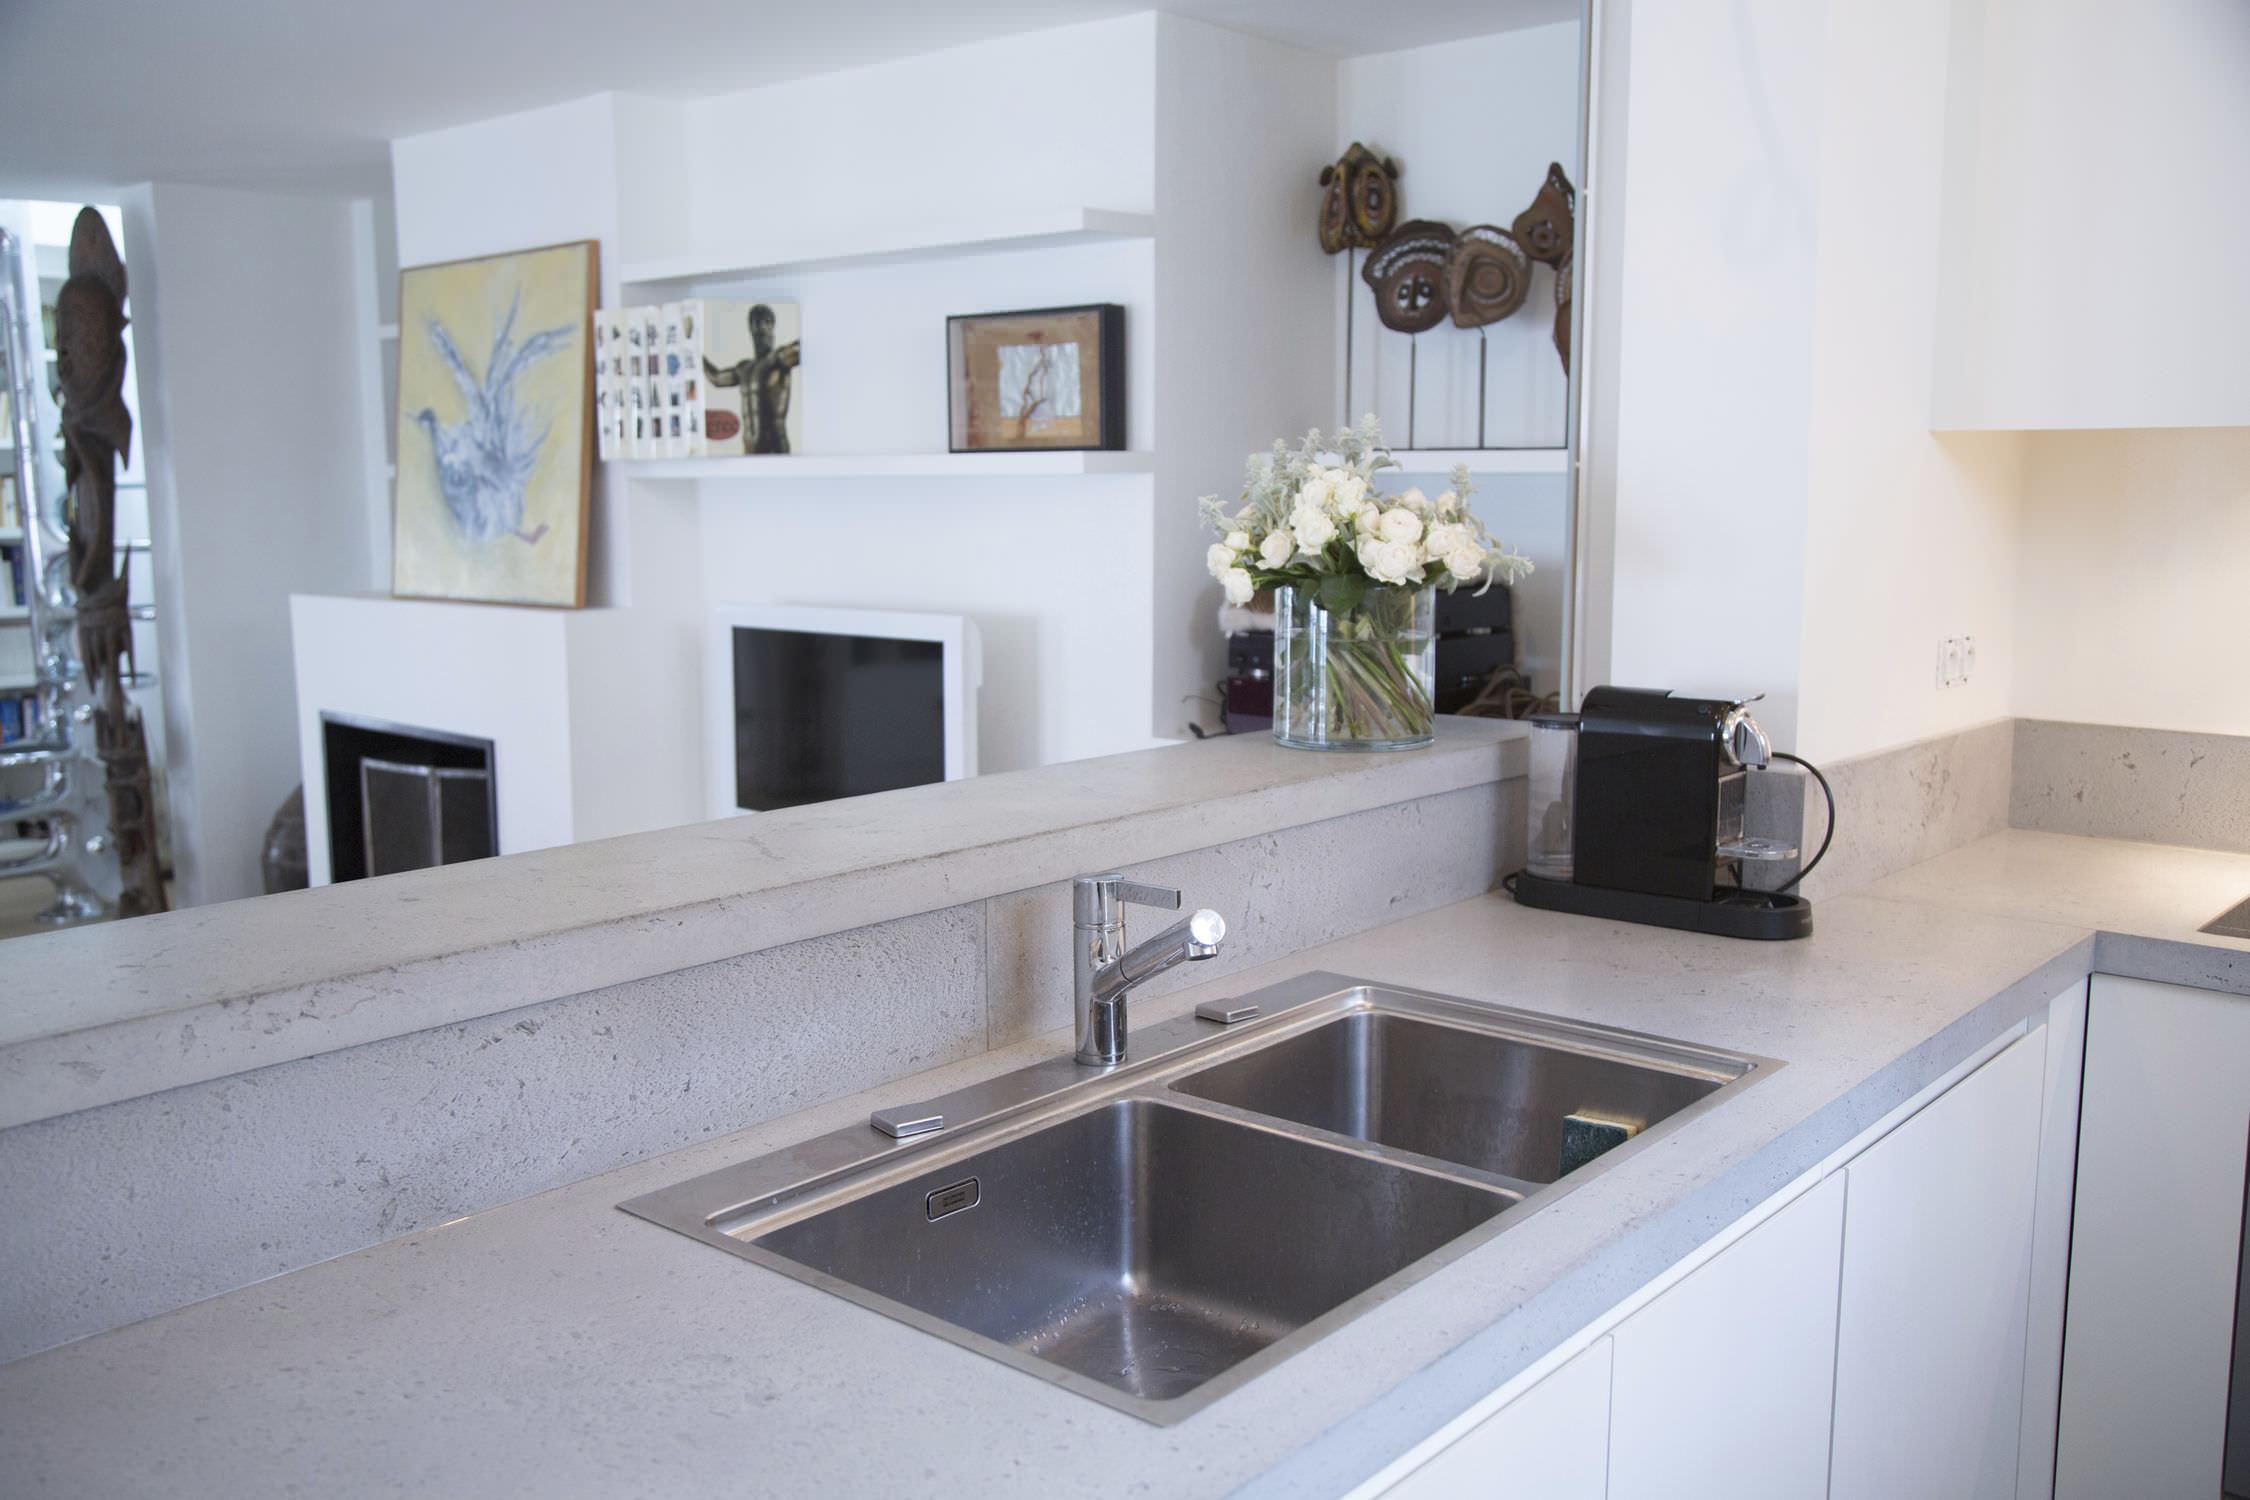 Beton-Arbeitsplatte / Küchen - Cuisine & crédence en béton ...